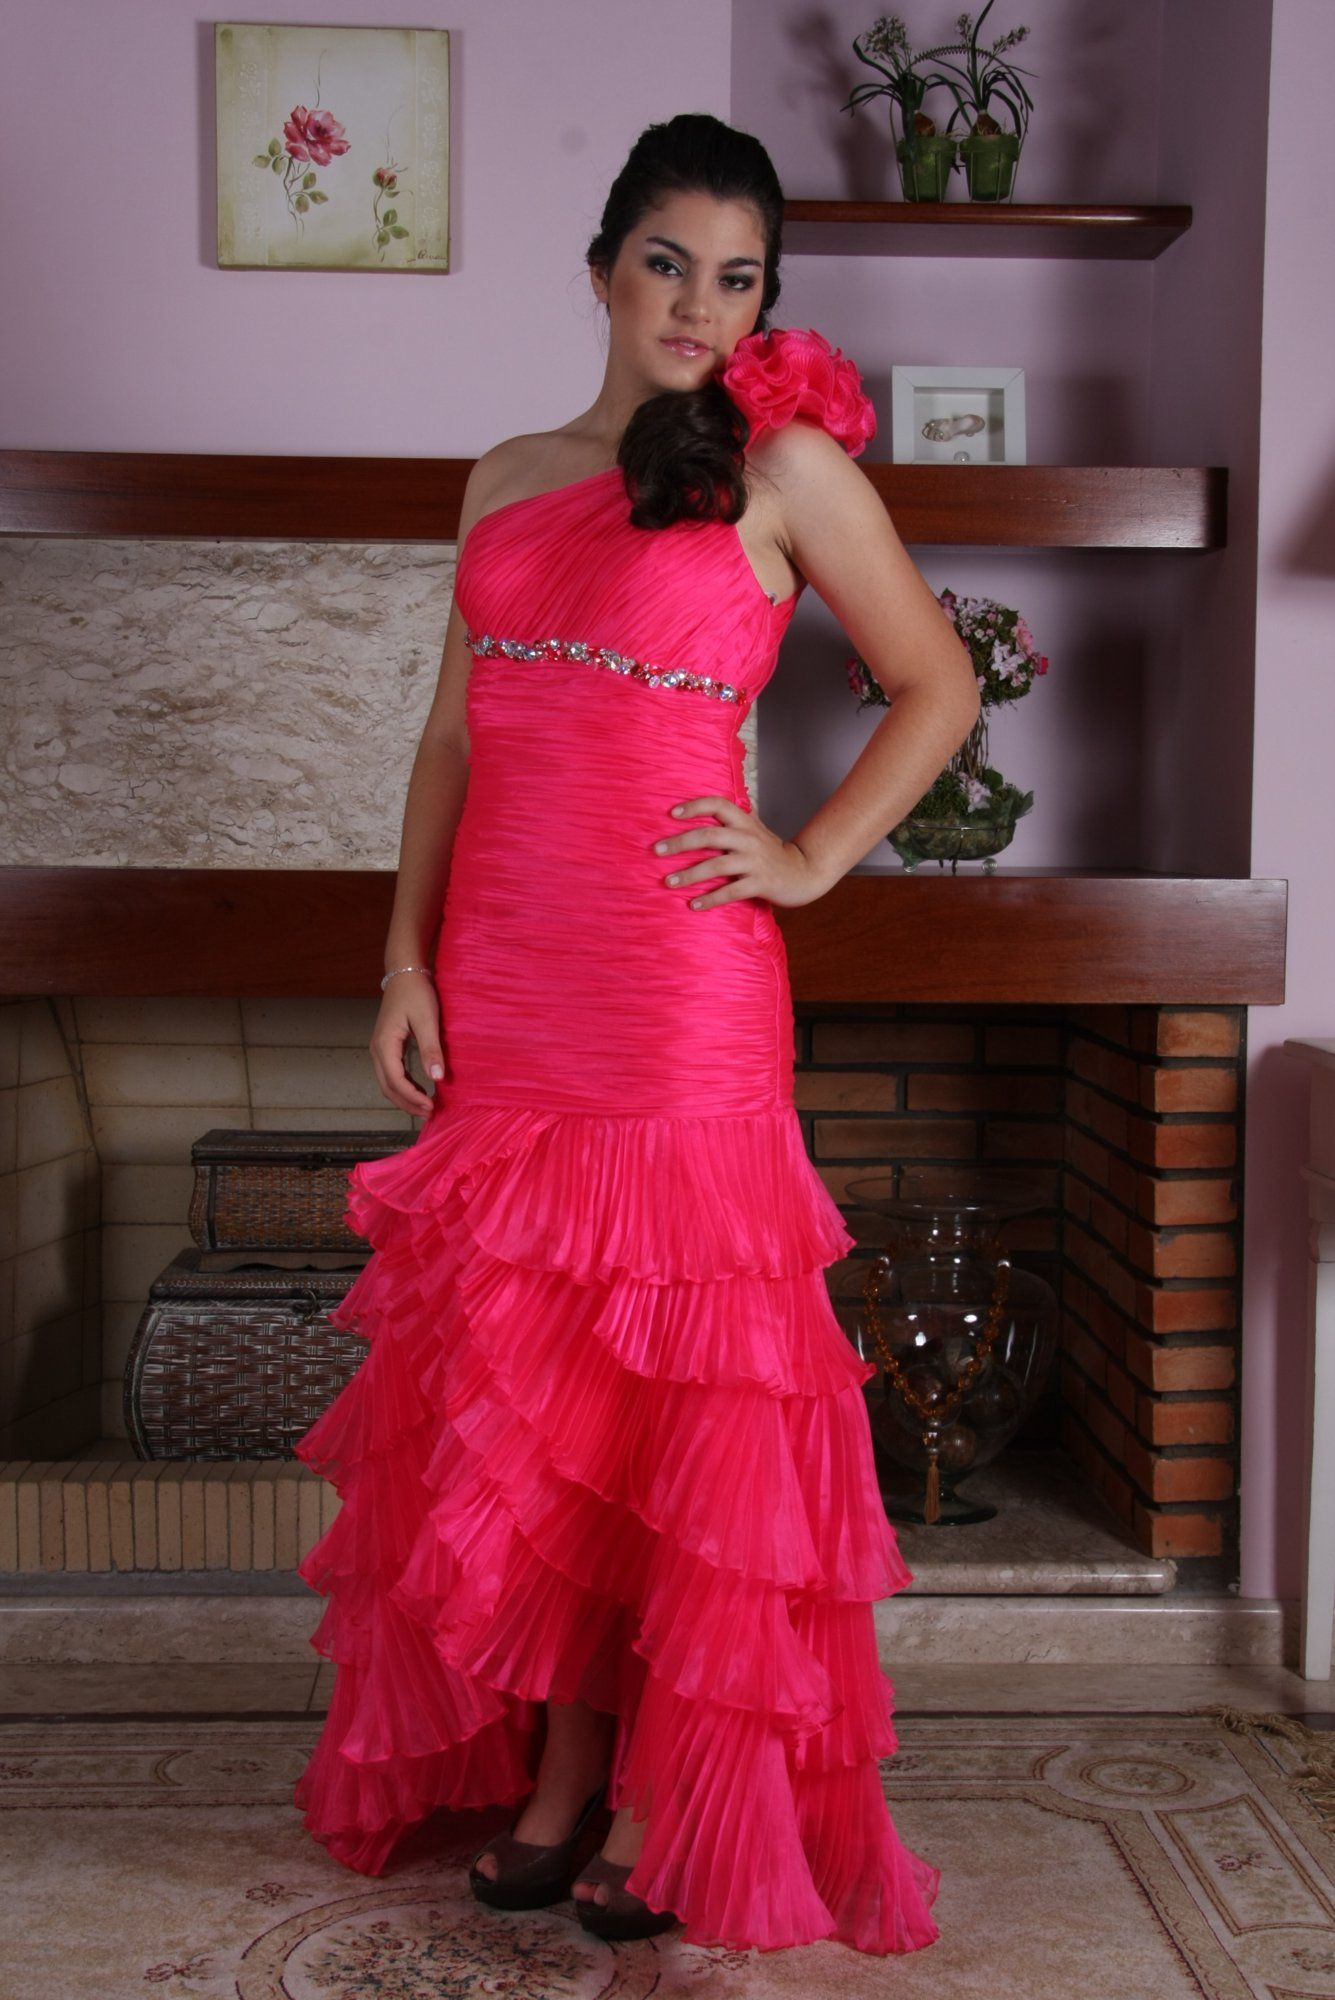 Vestido de Debutante Pink - 20 - Hipnose Alta Costura e Spa para Noivas e Noivos - Campinas - SP Vestido de Debutante, Vestido de Debutante Pink, Hipnose Alta Costura